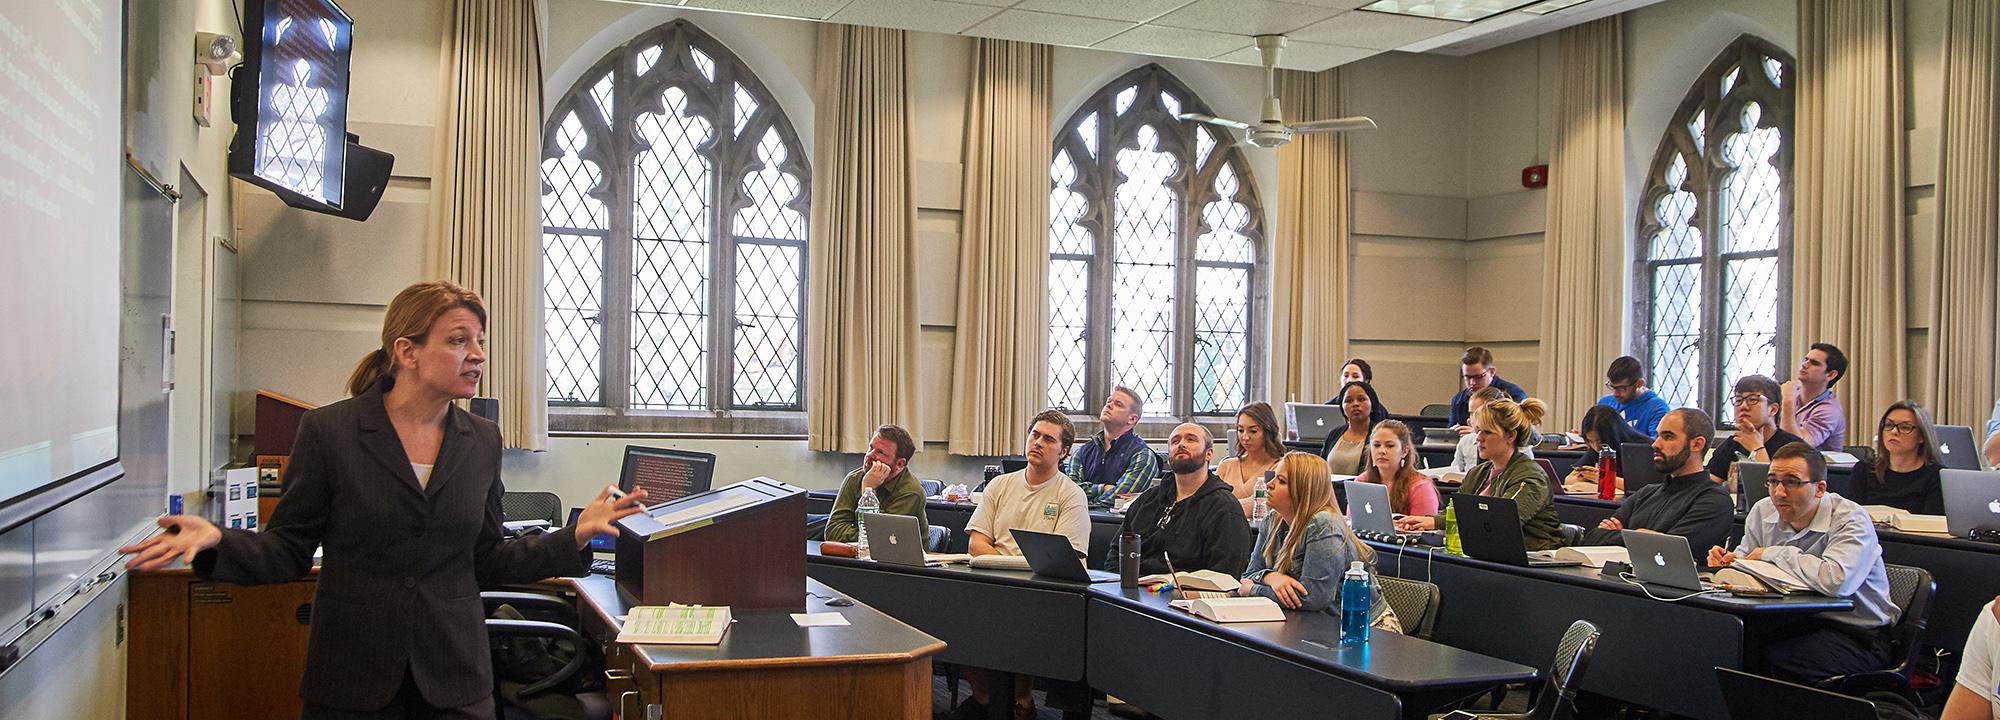 professor teaching class at UConn School of Law